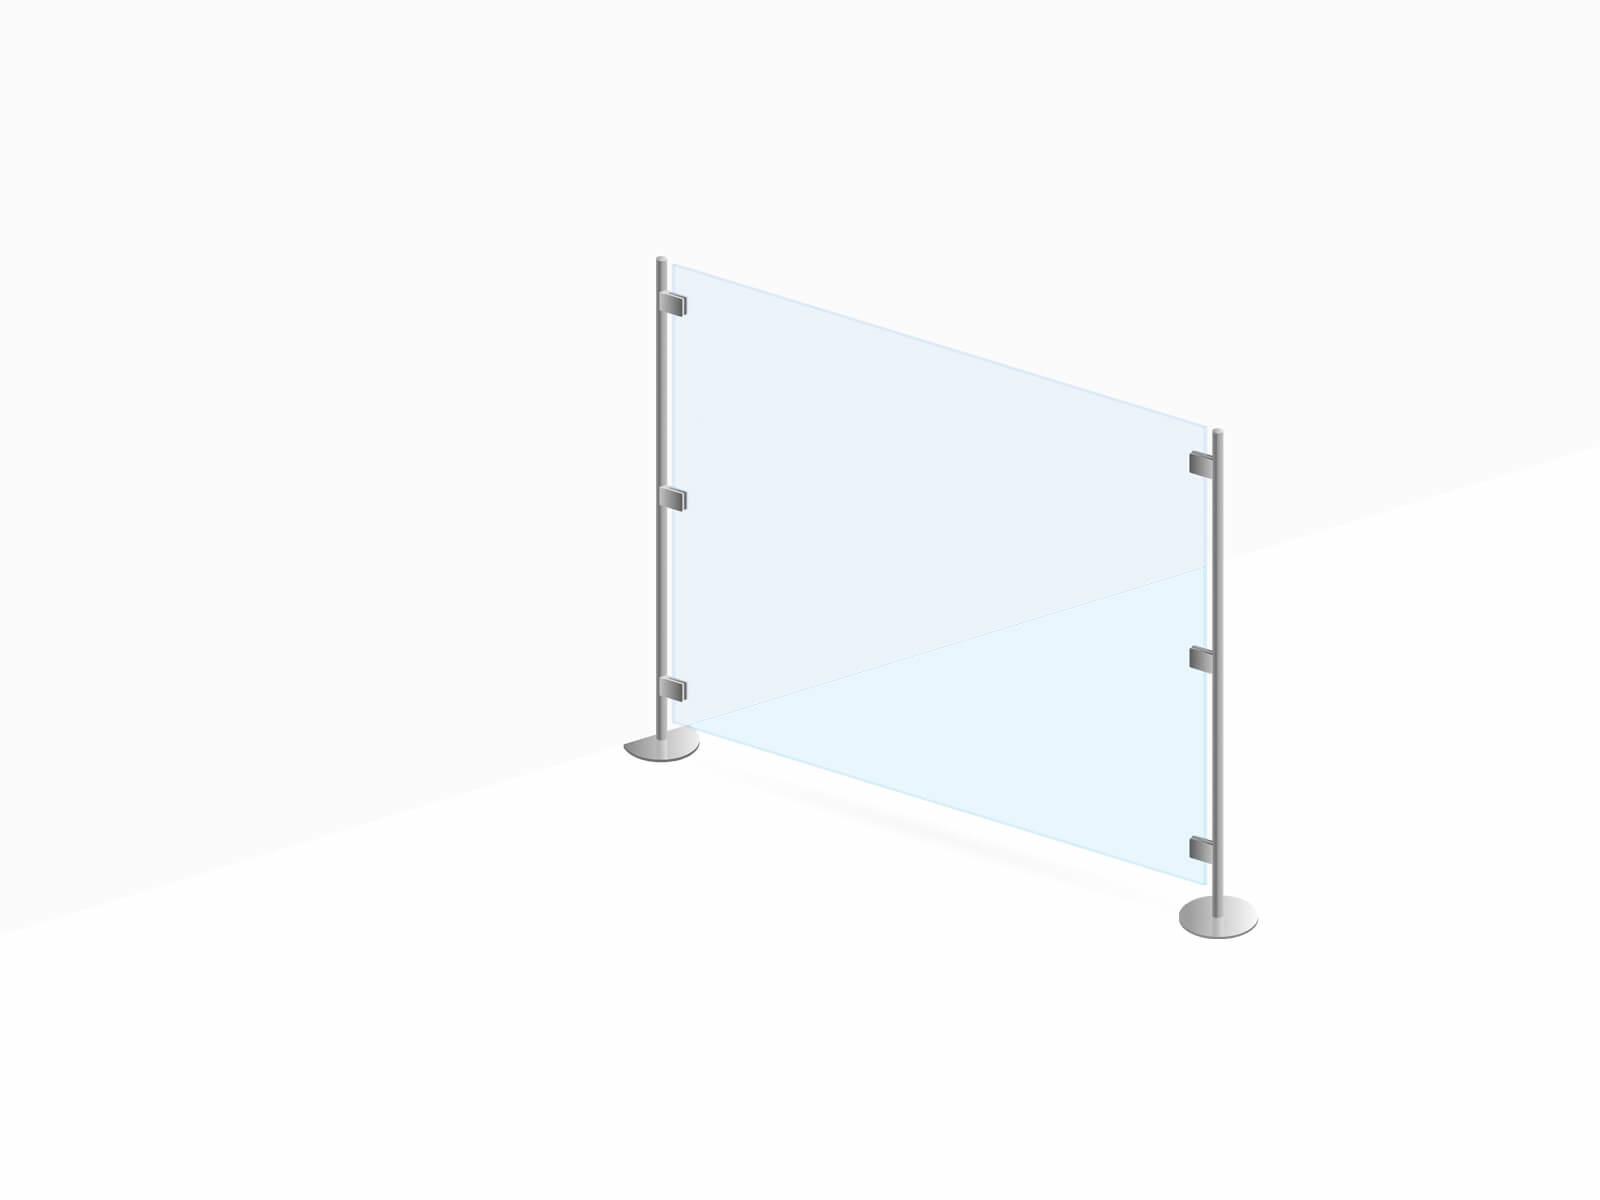 stellwand-ein-glaselement-an-wand